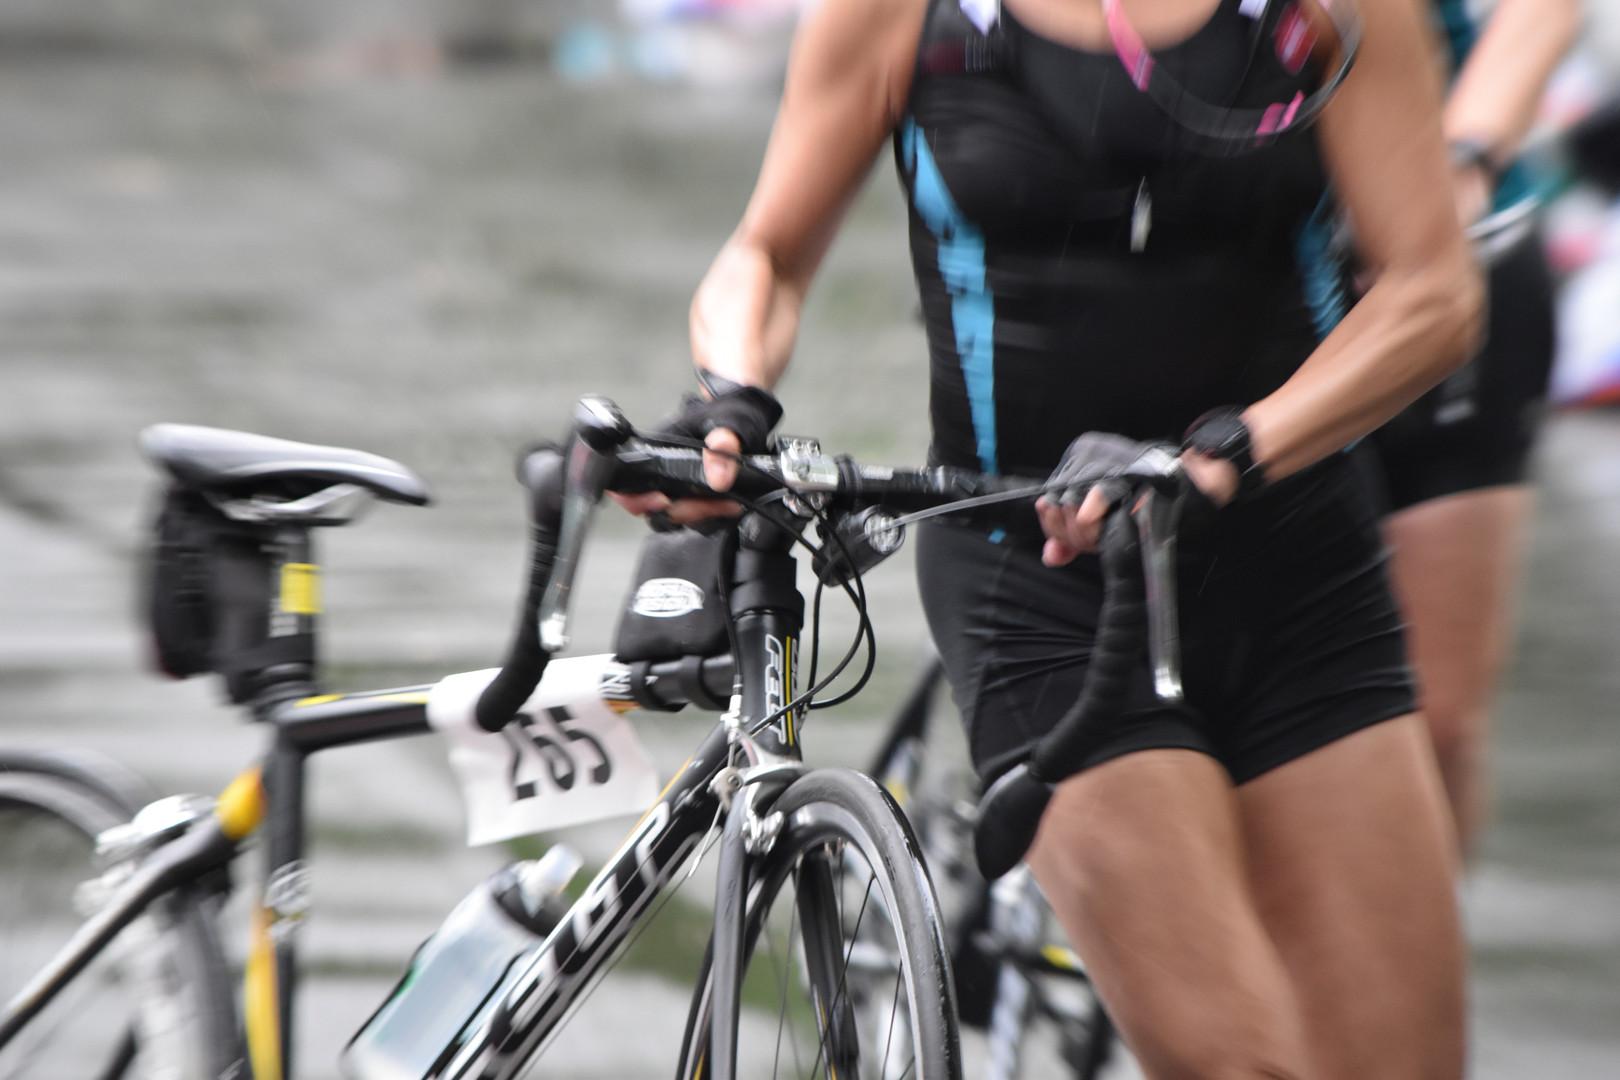 Lindyfitnessbar triathlon.jpg